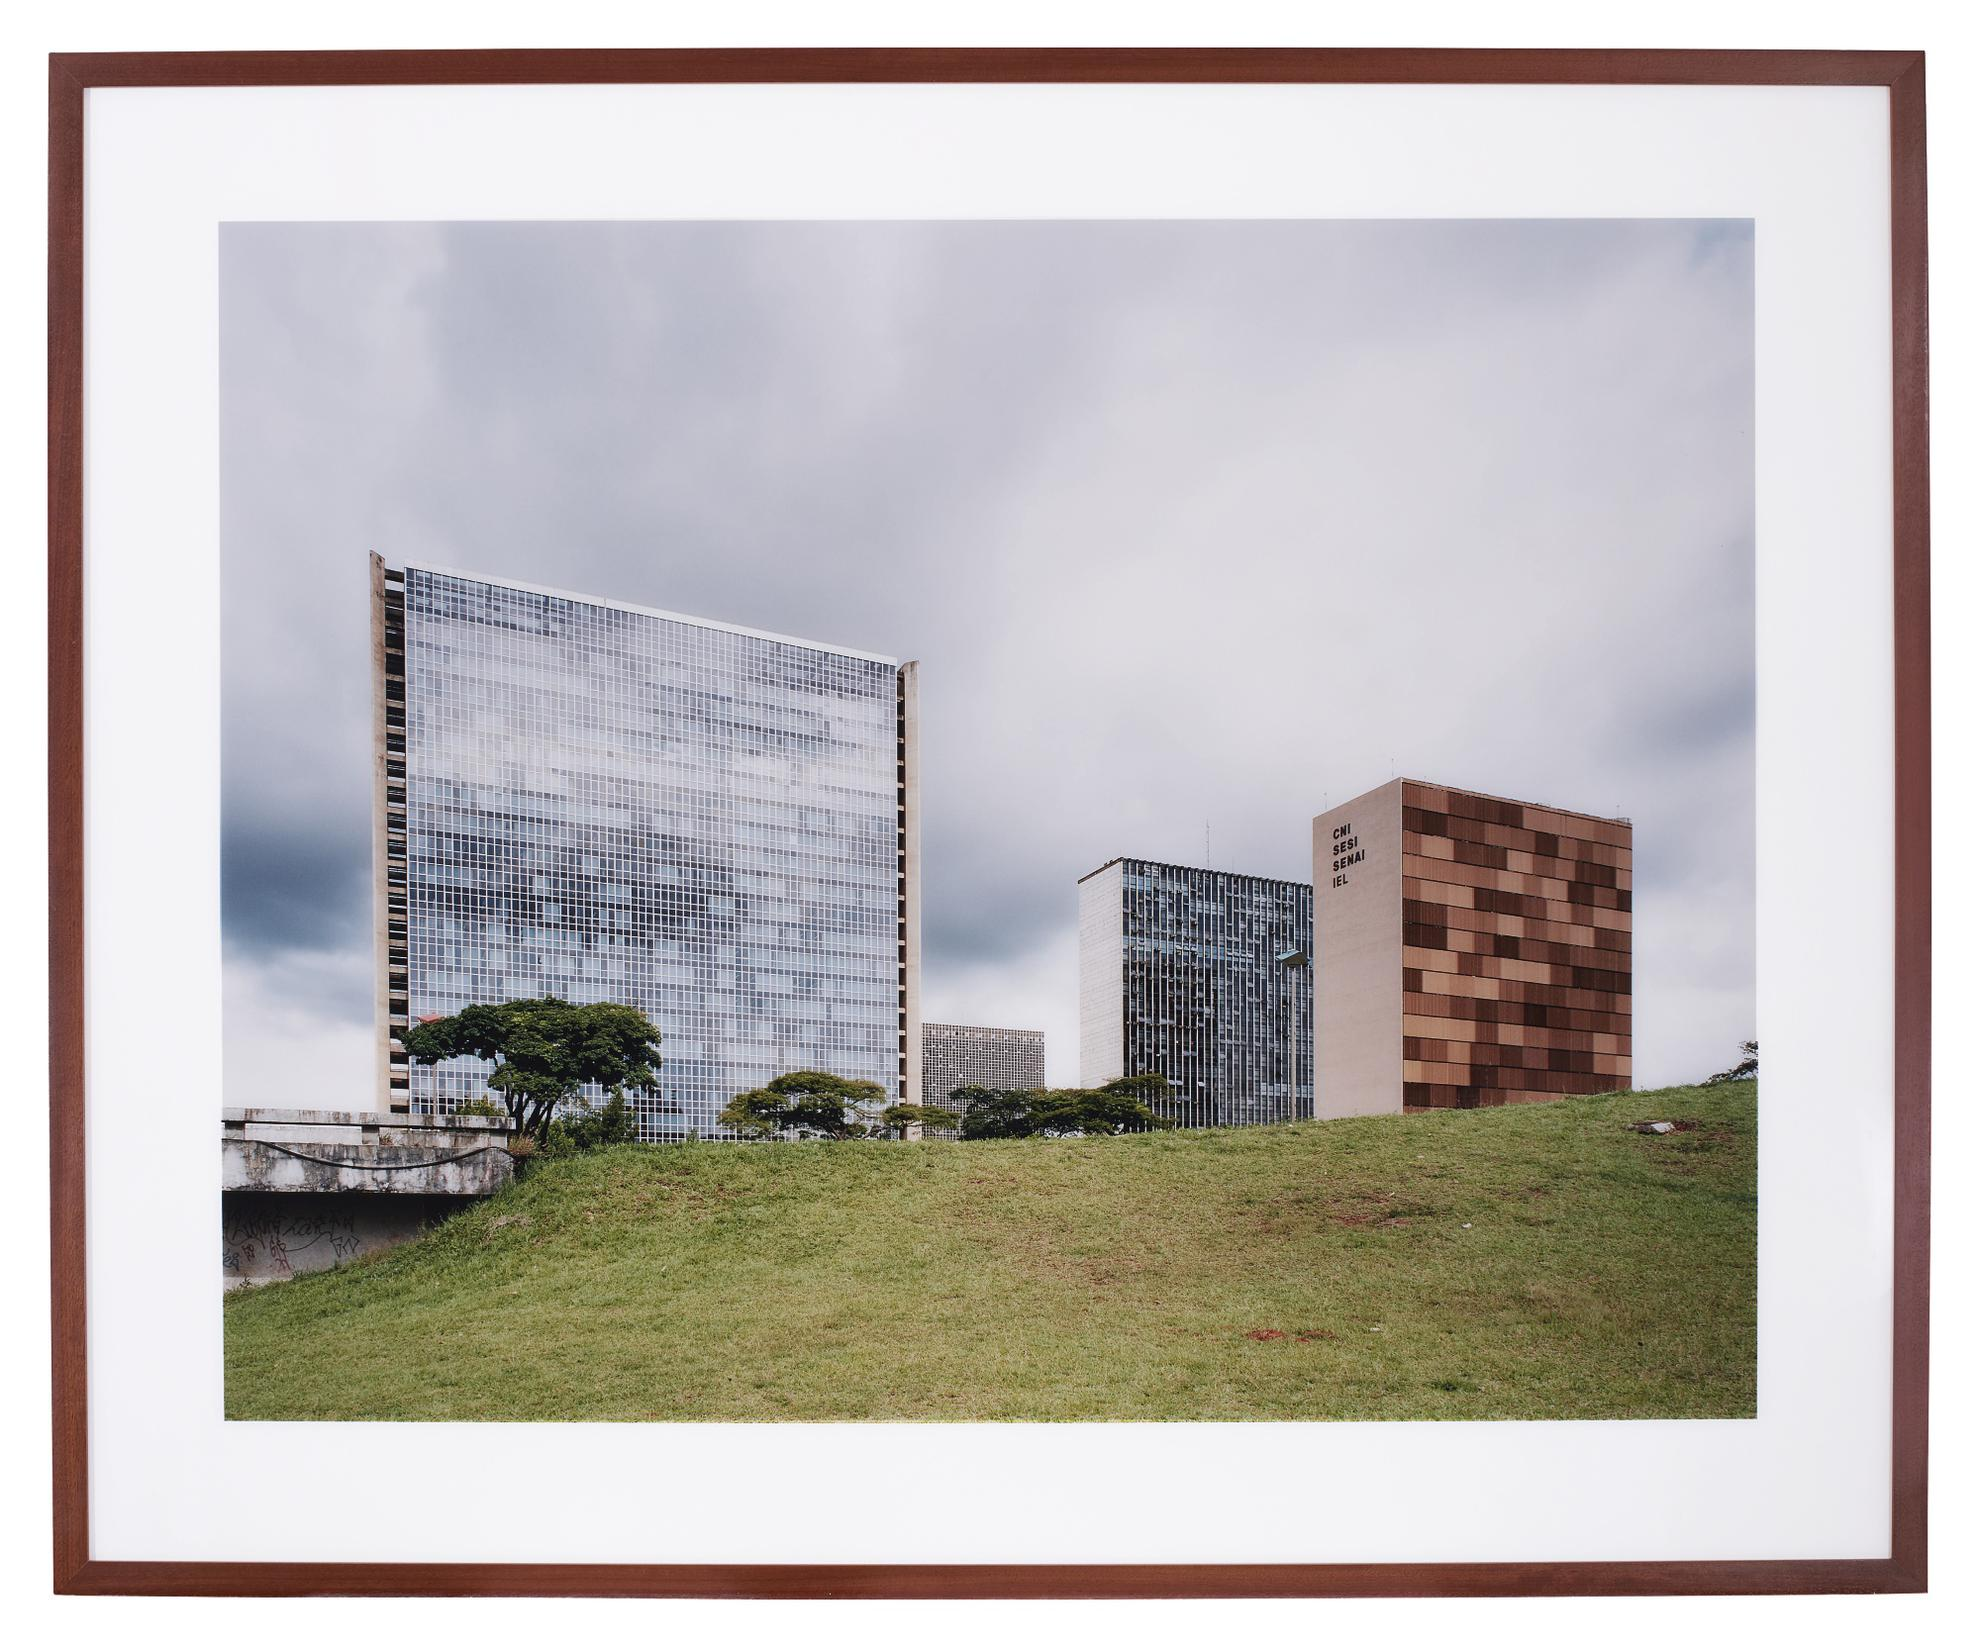 Andreas Gursky-Banksektor Nord, Brasilia-1994